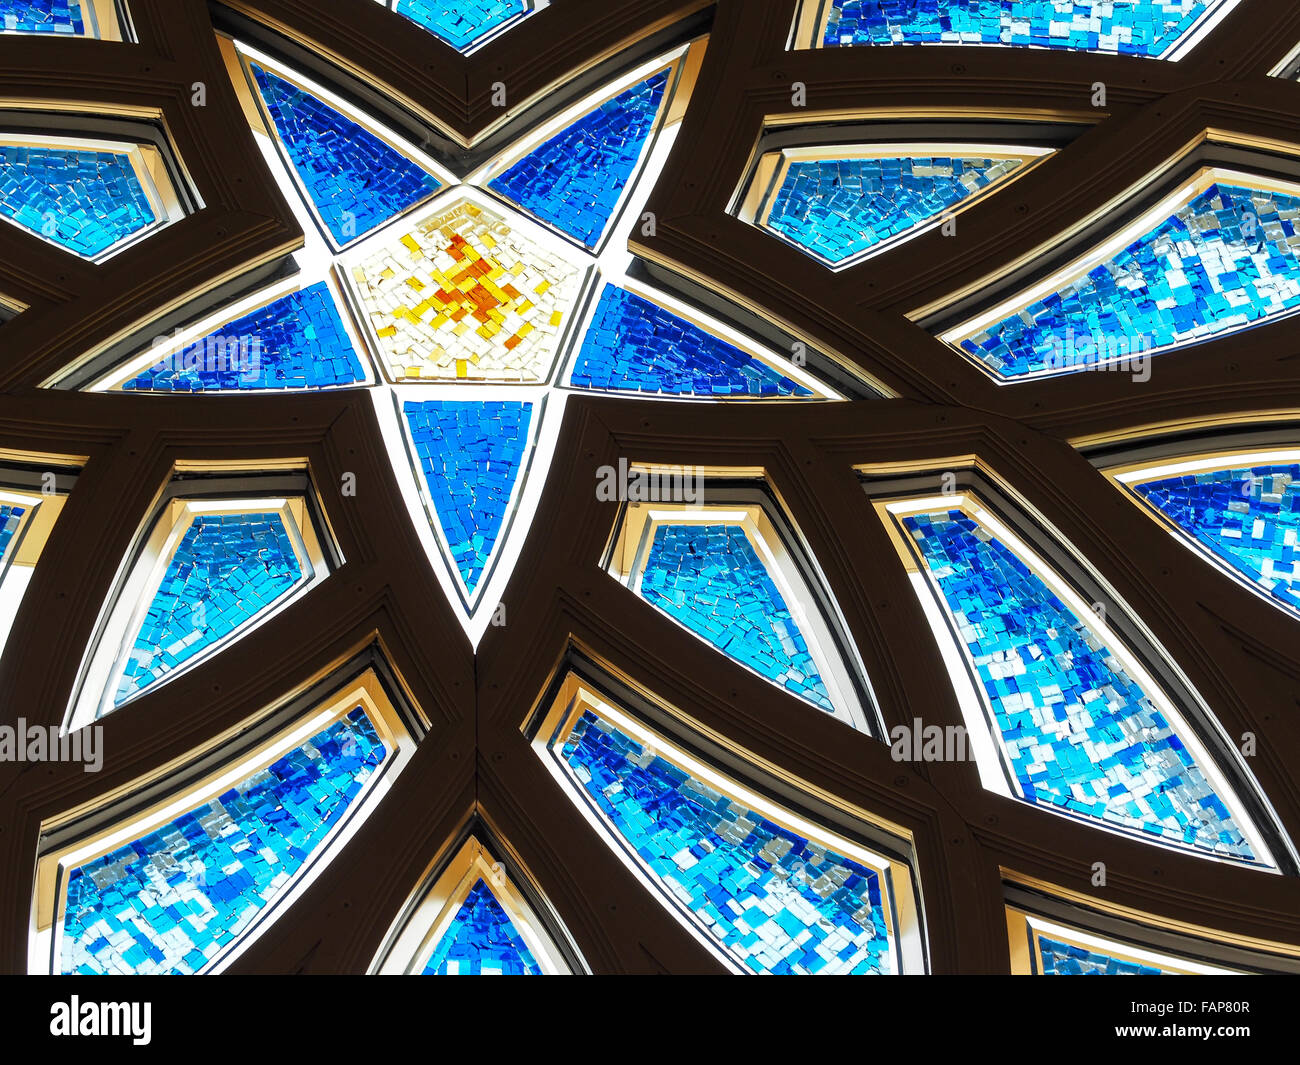 La Mosquée Sheikh Zayed, Abu Dhabi, Émirats Arabes Unis Photo Stock